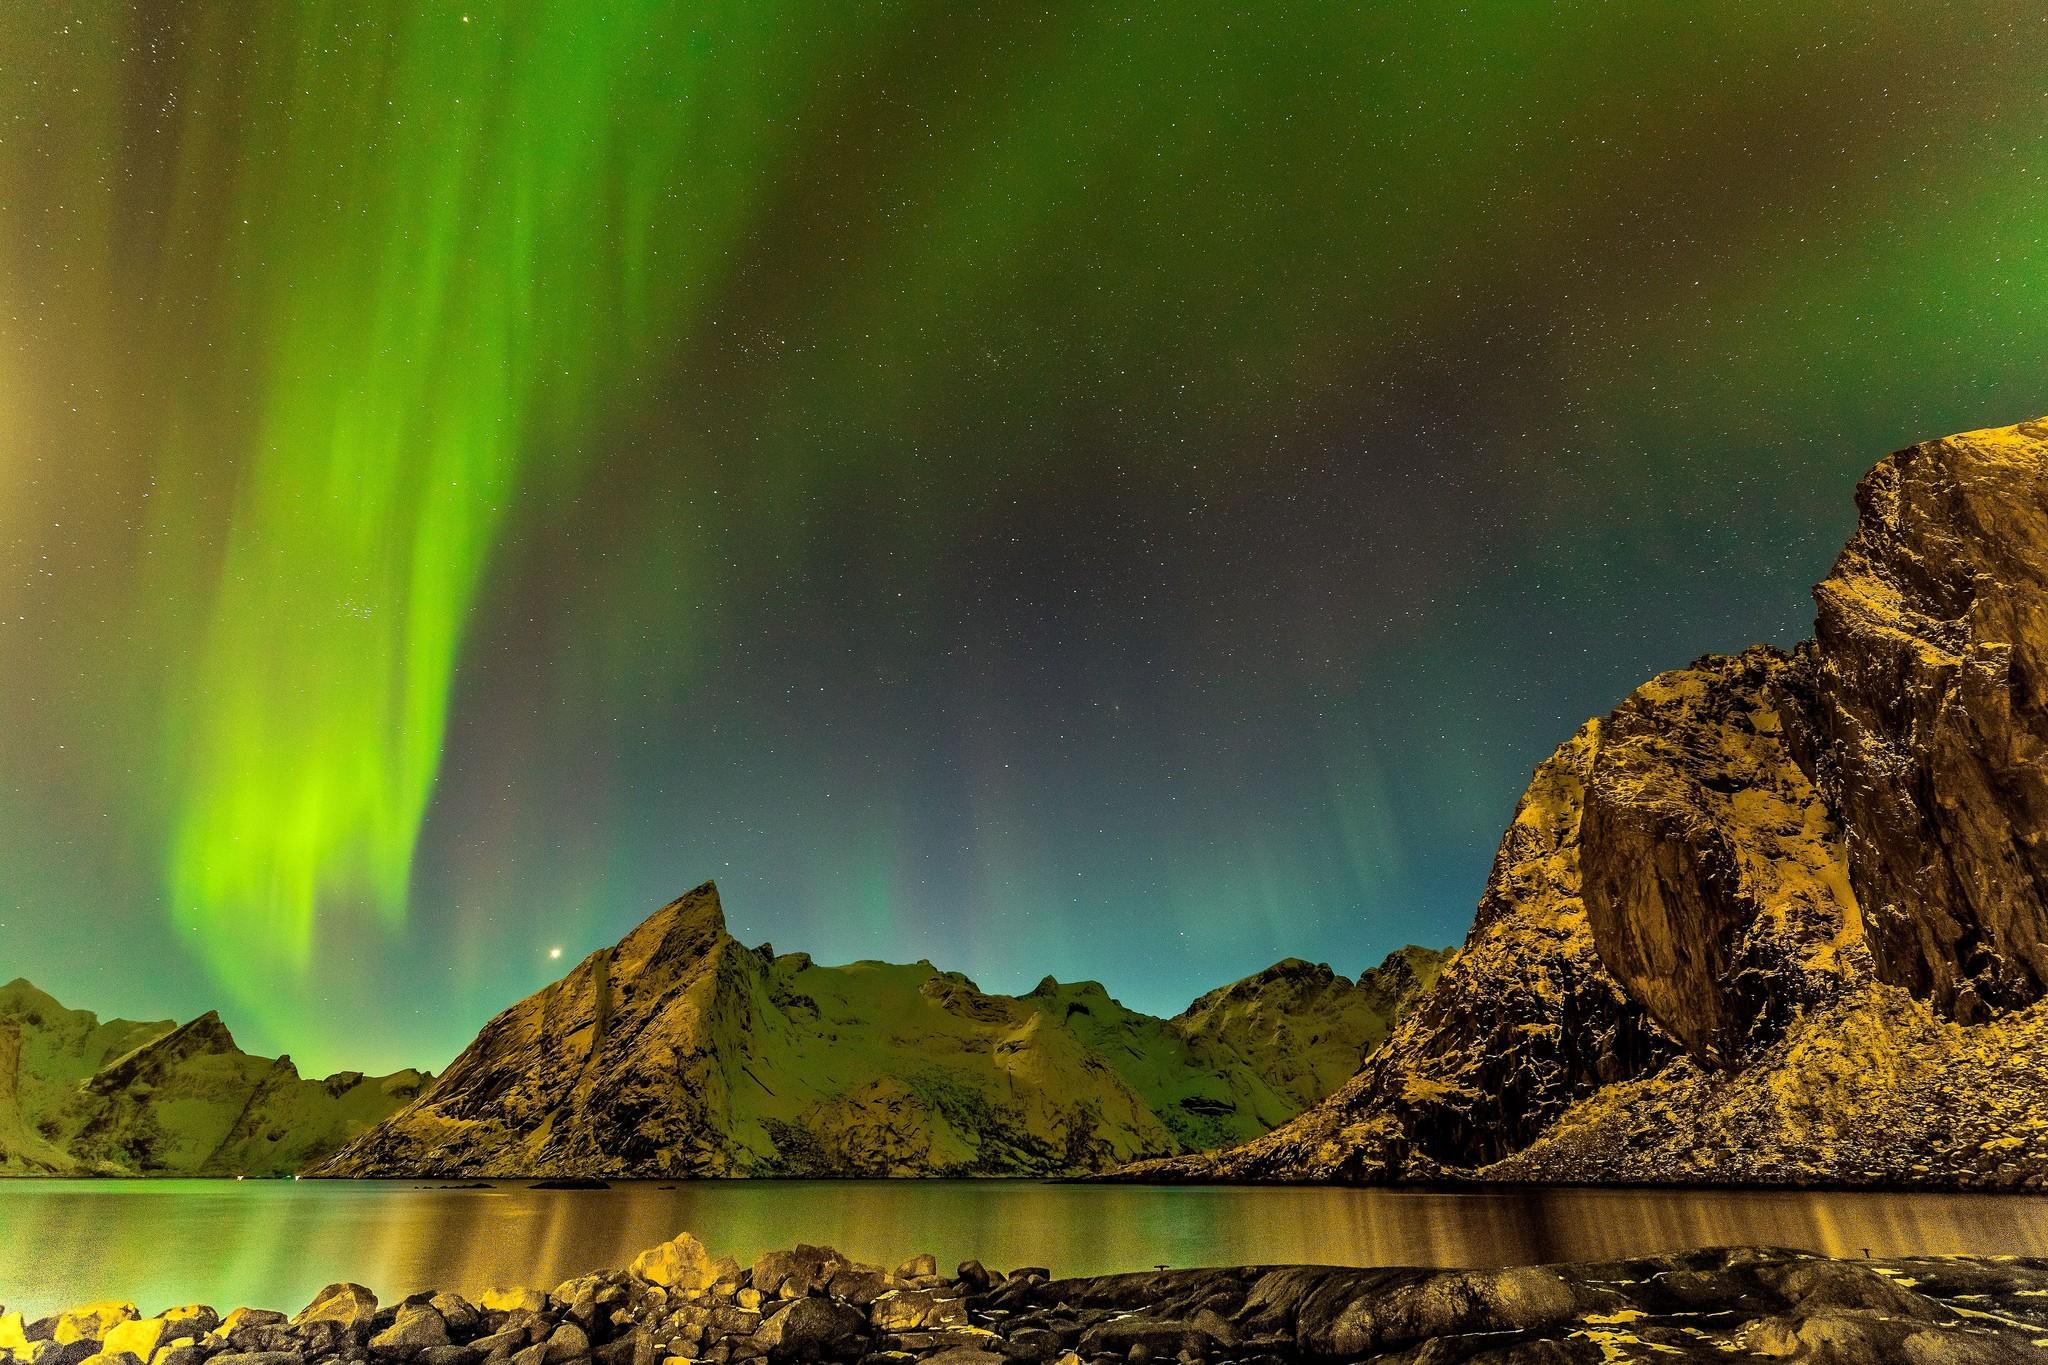 General 2048x1365 landscape aurorae nordic landscapes sky skyscape mountains